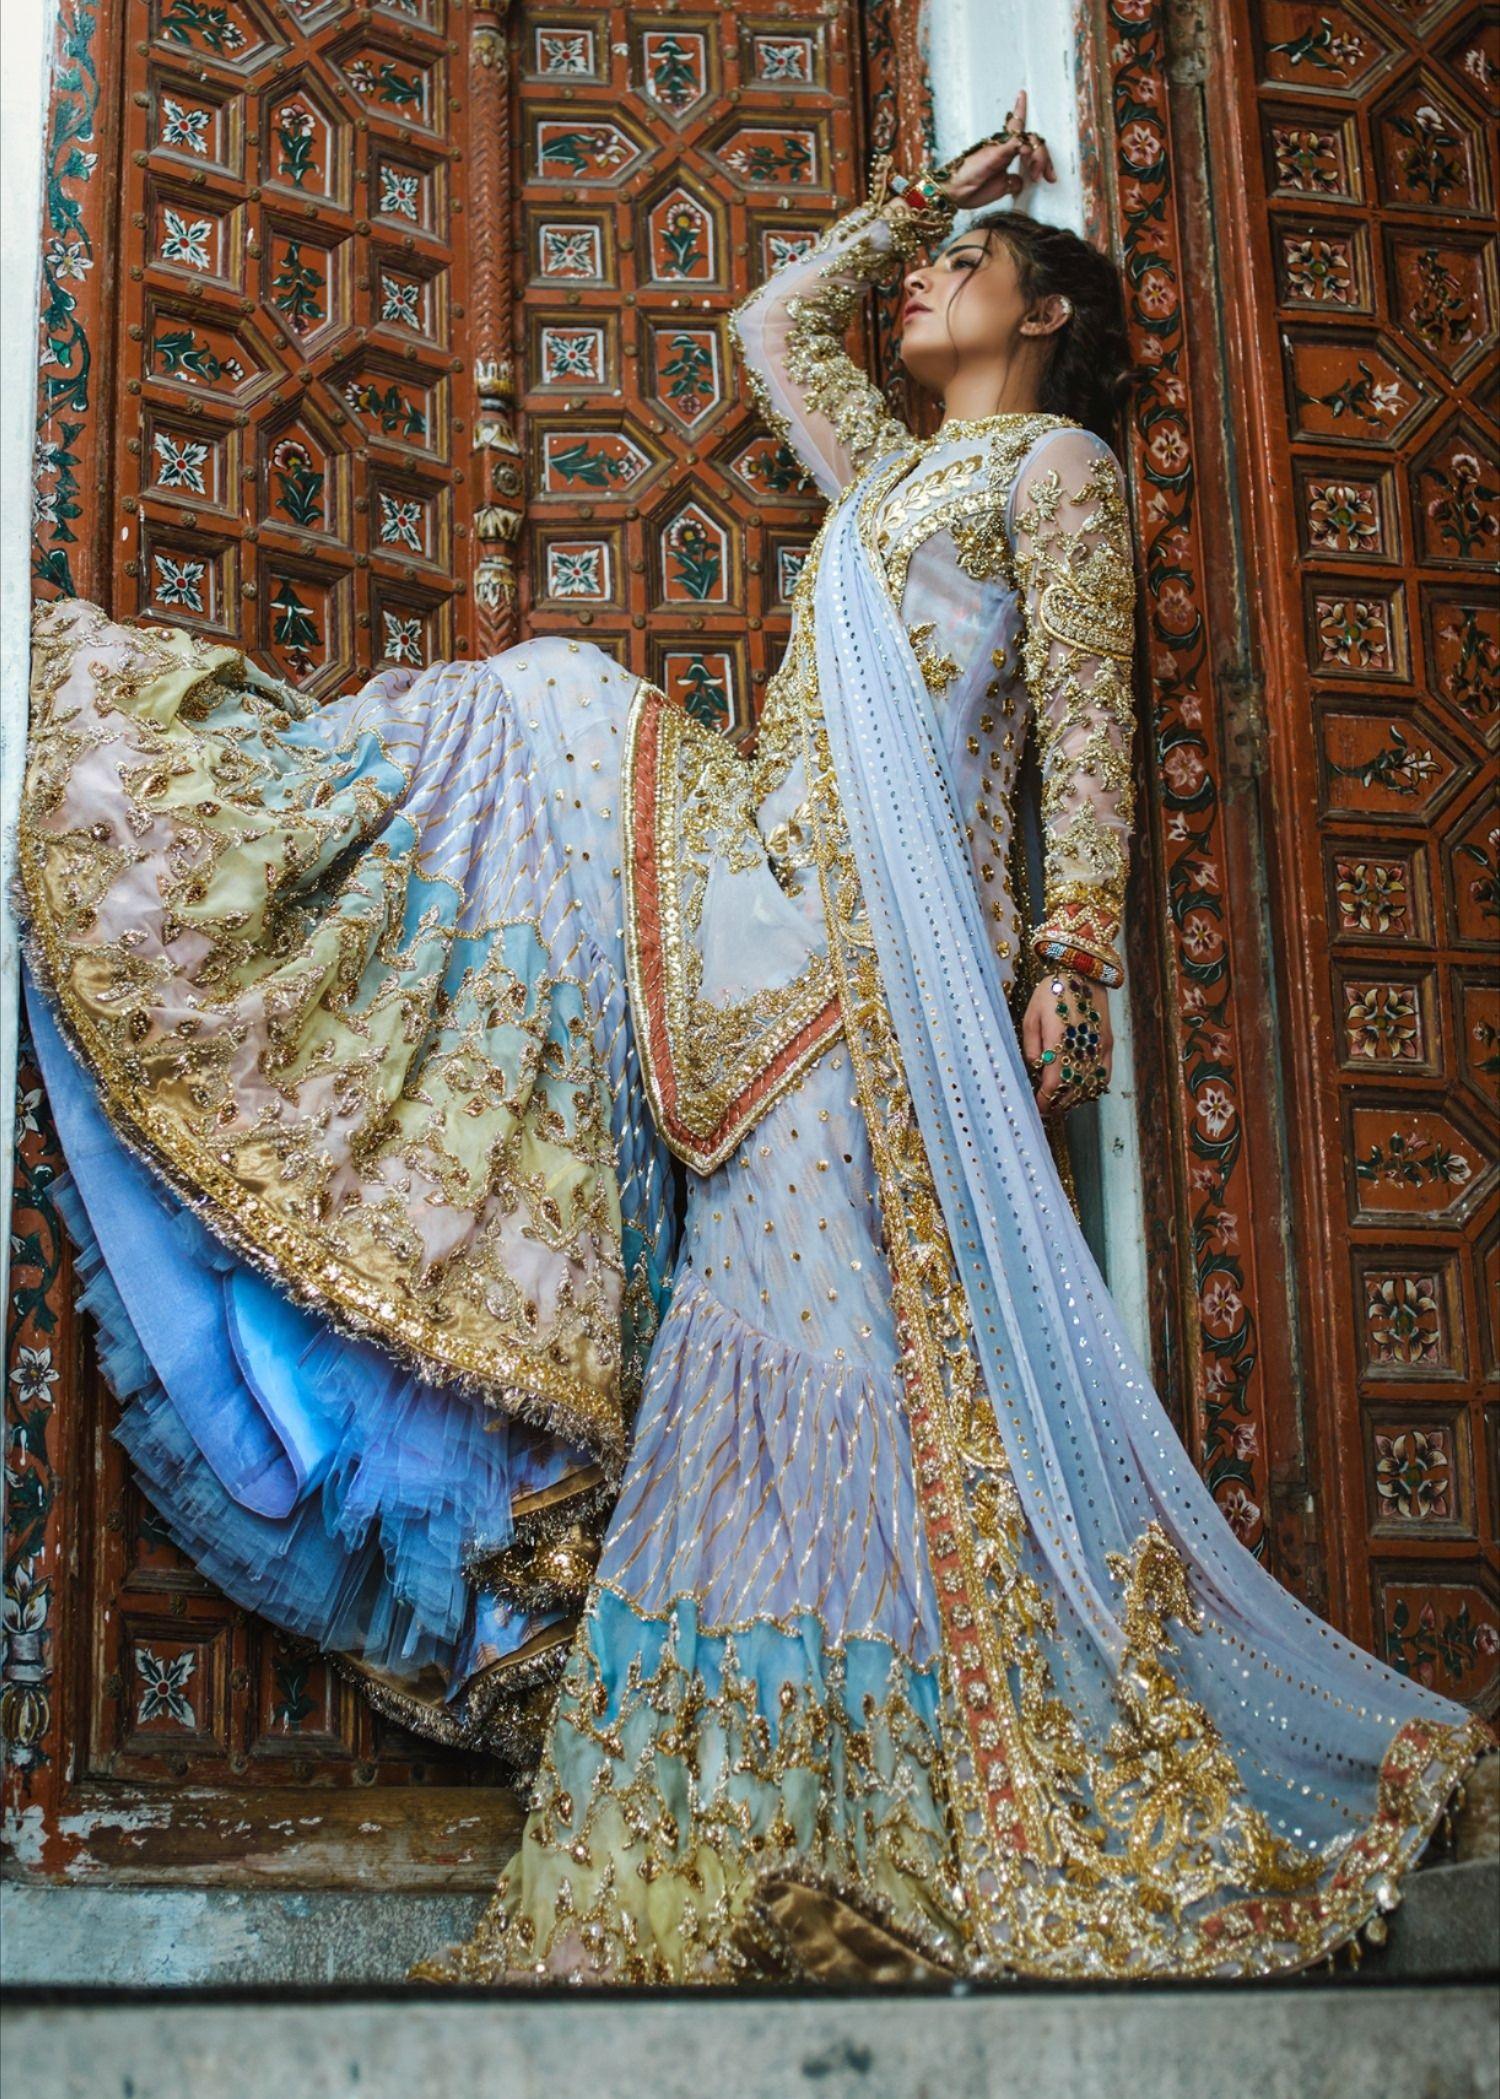 Beautiful Indian gharara dress for wedding wear in blue